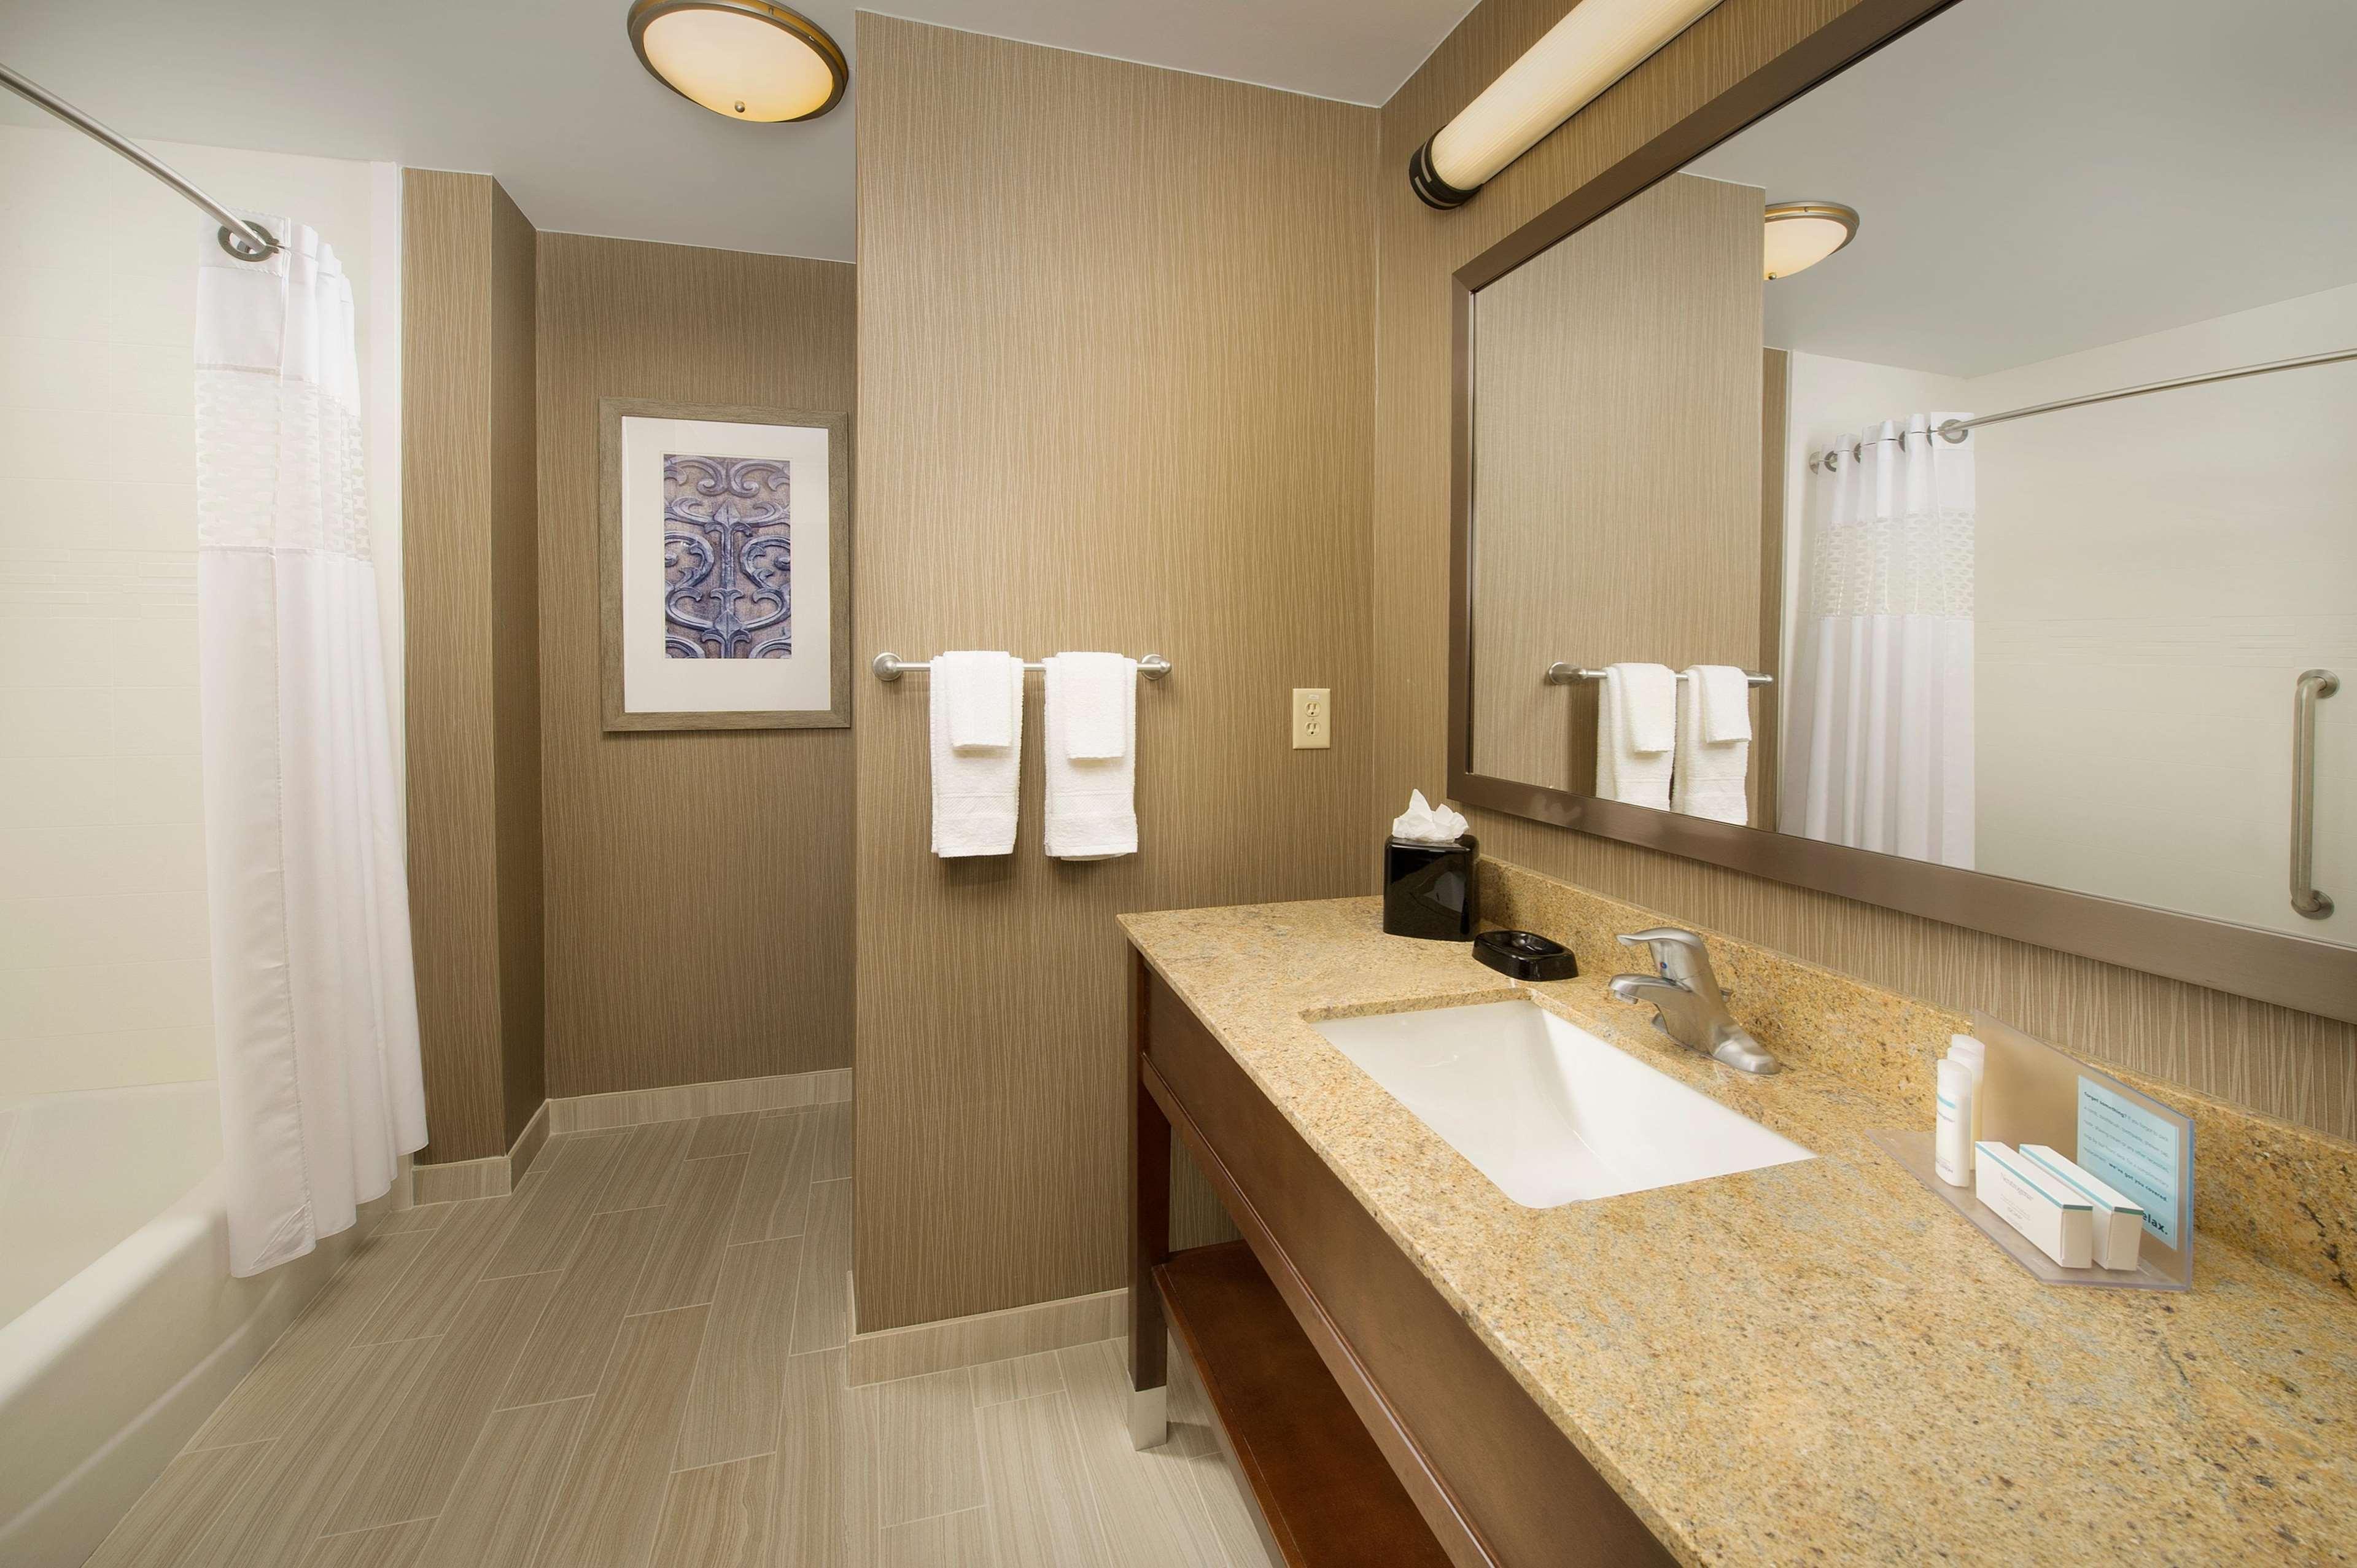 Hampton Inn & Suites San Antonio-Downtown/Market Square image 13